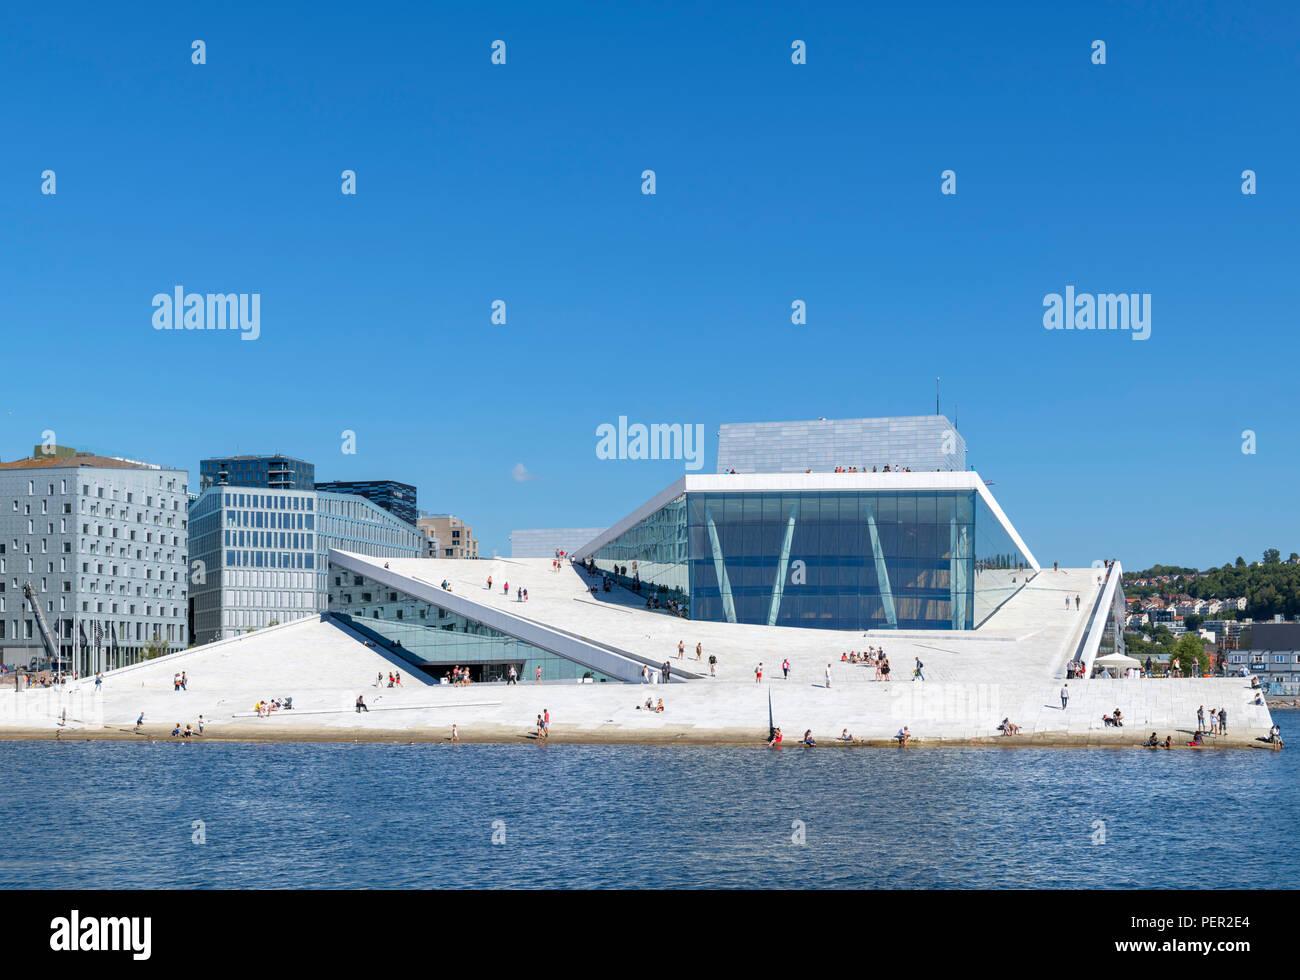 Oslo Opera House (Den Norske Opera & Ballett), Oslo, Norway - Stock Image